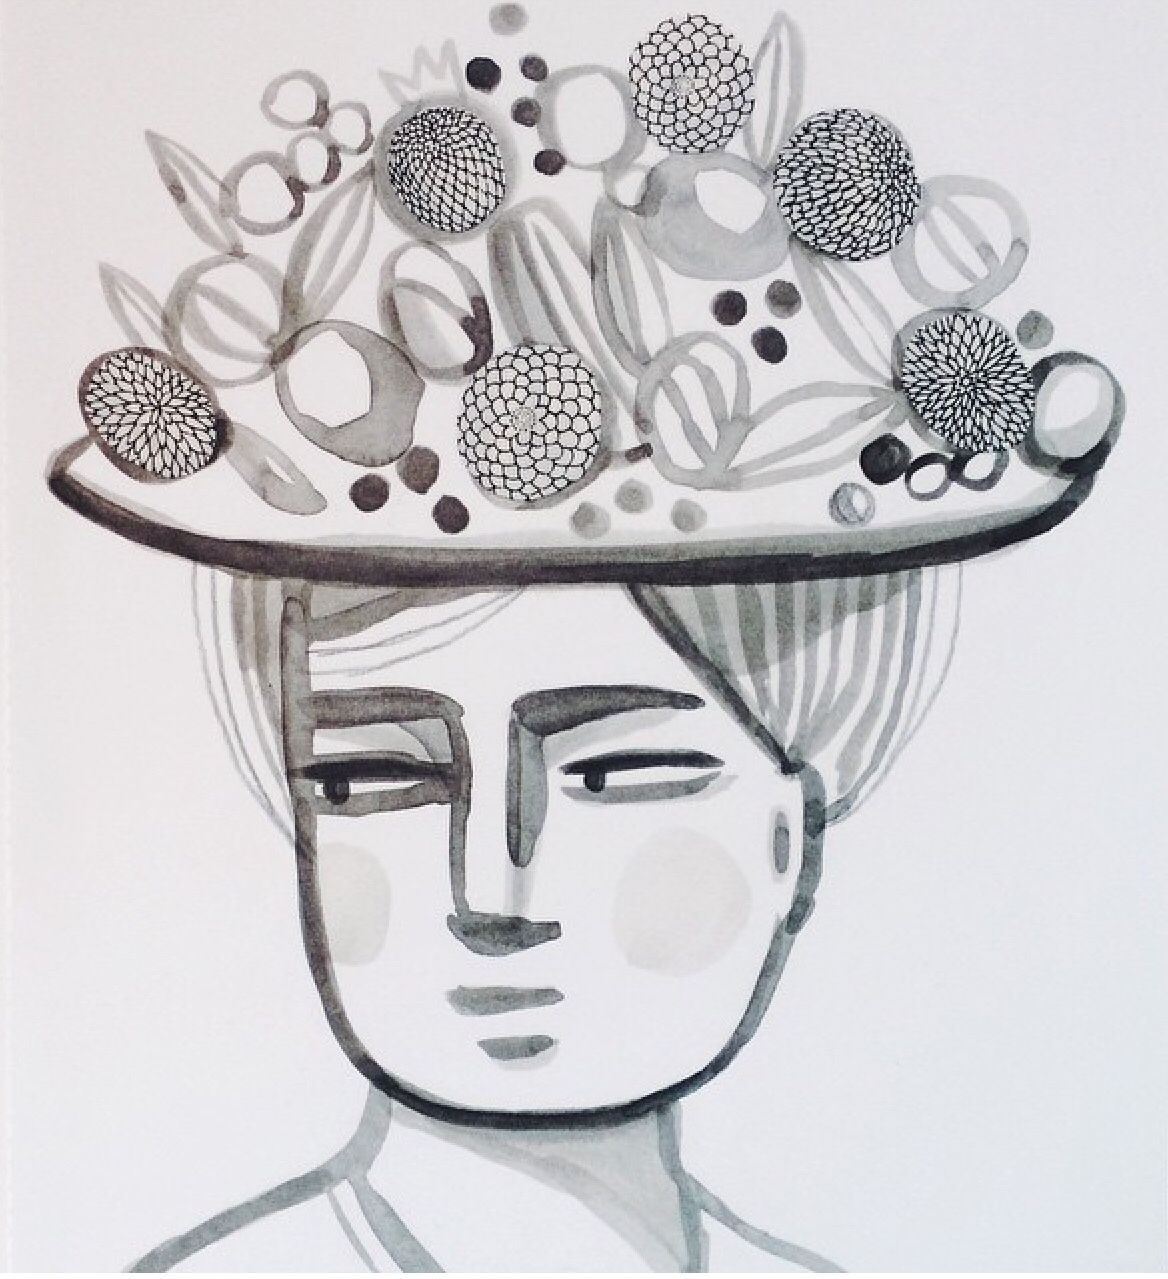 Daysinbloom - Larissa Bertonasco - La cucina verde | Artes ...